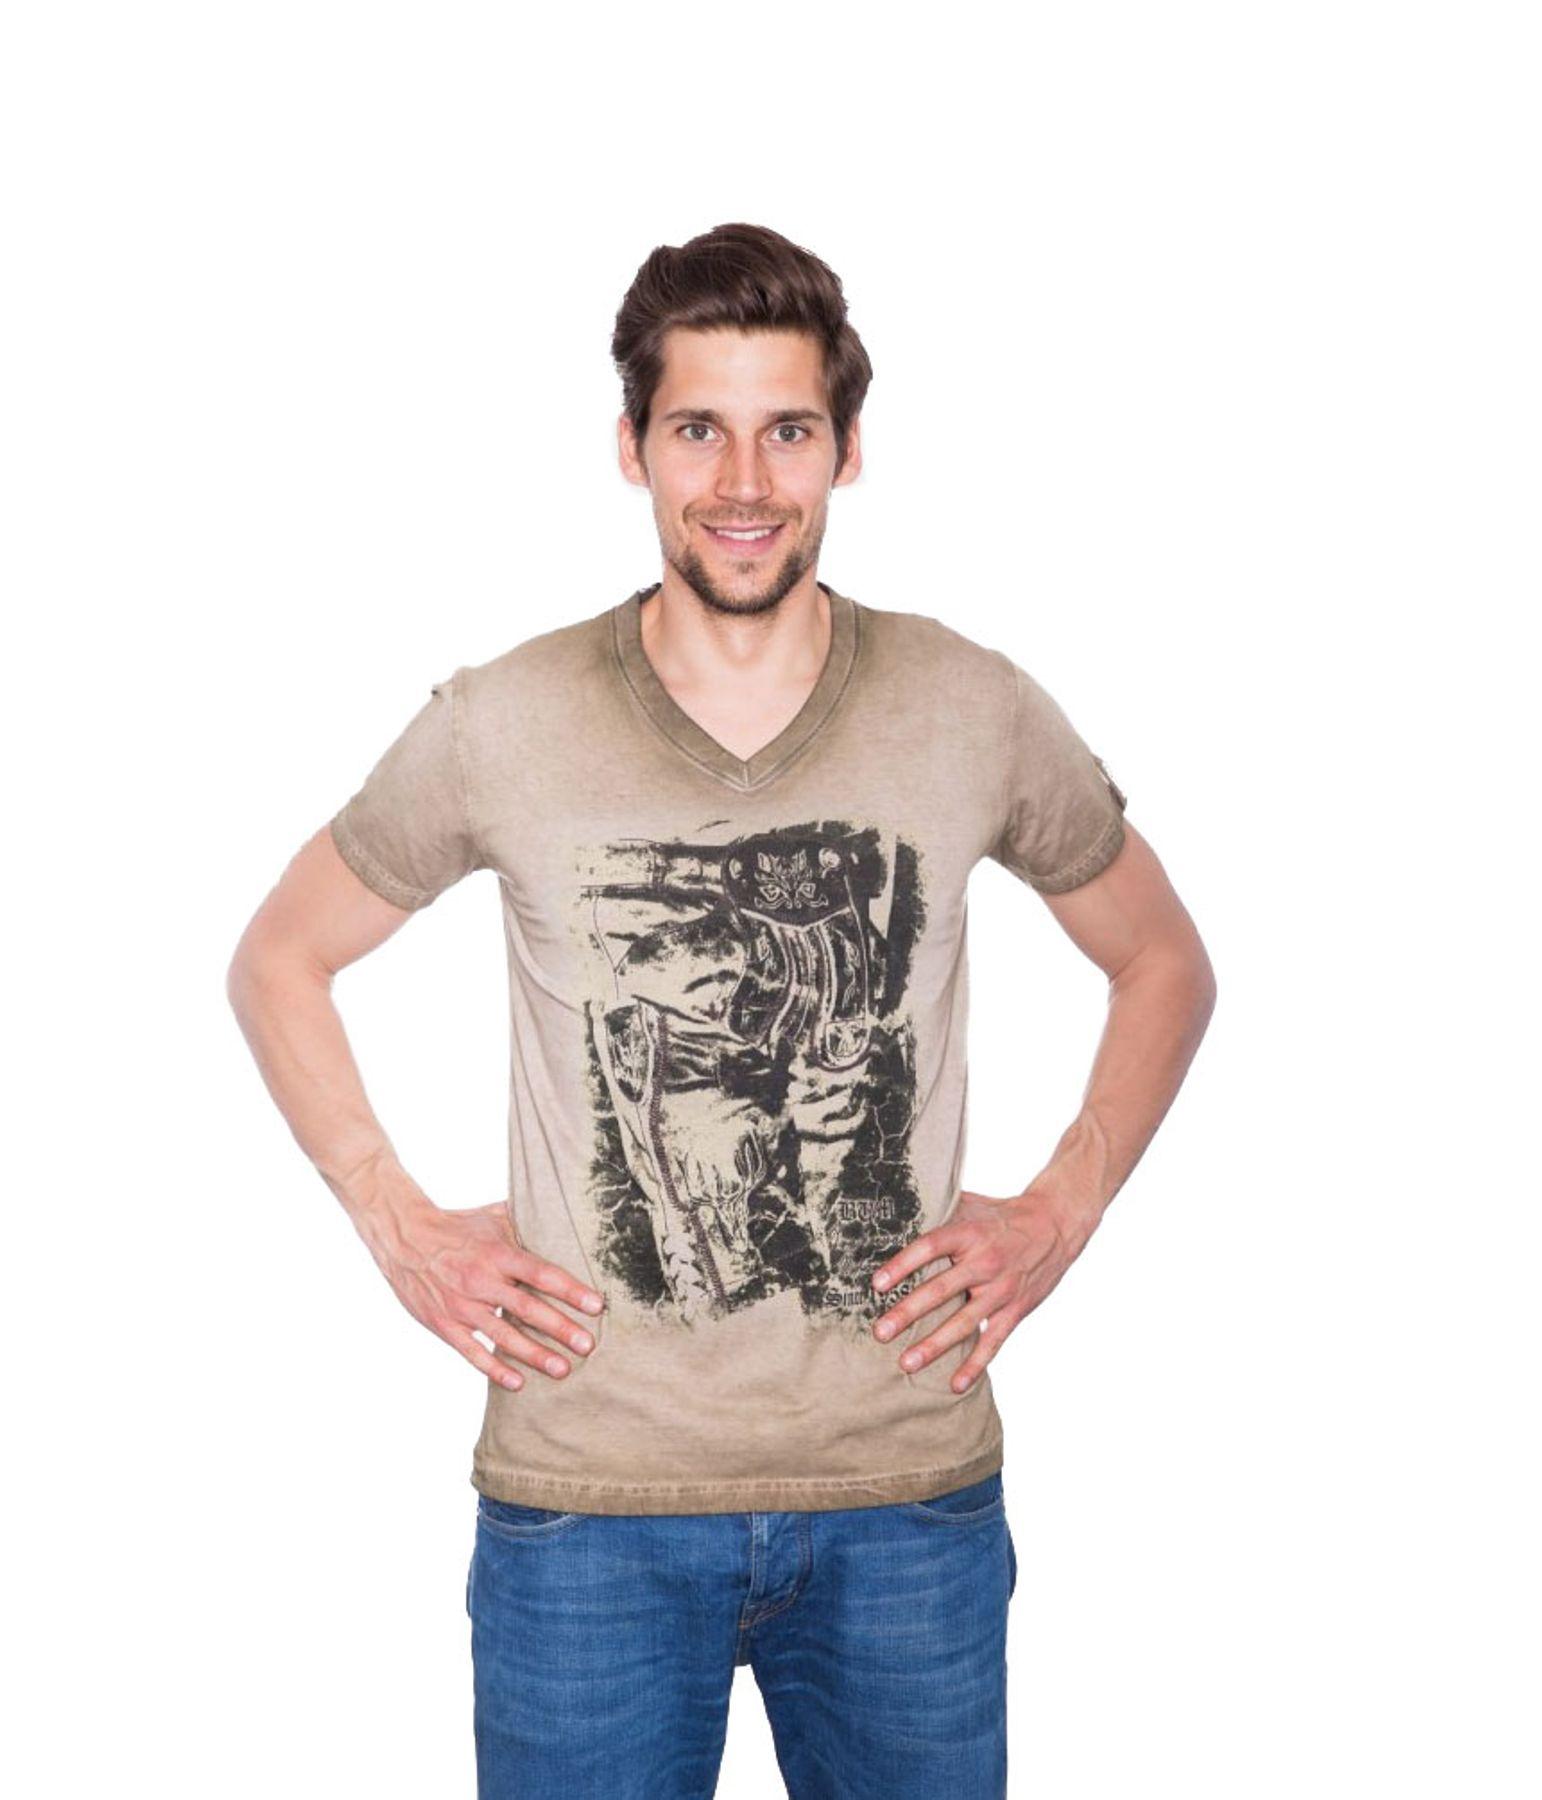 Krüger - Herren Trachten T-Shirt in braun, Seppelhose (91280-7) – Bild 1